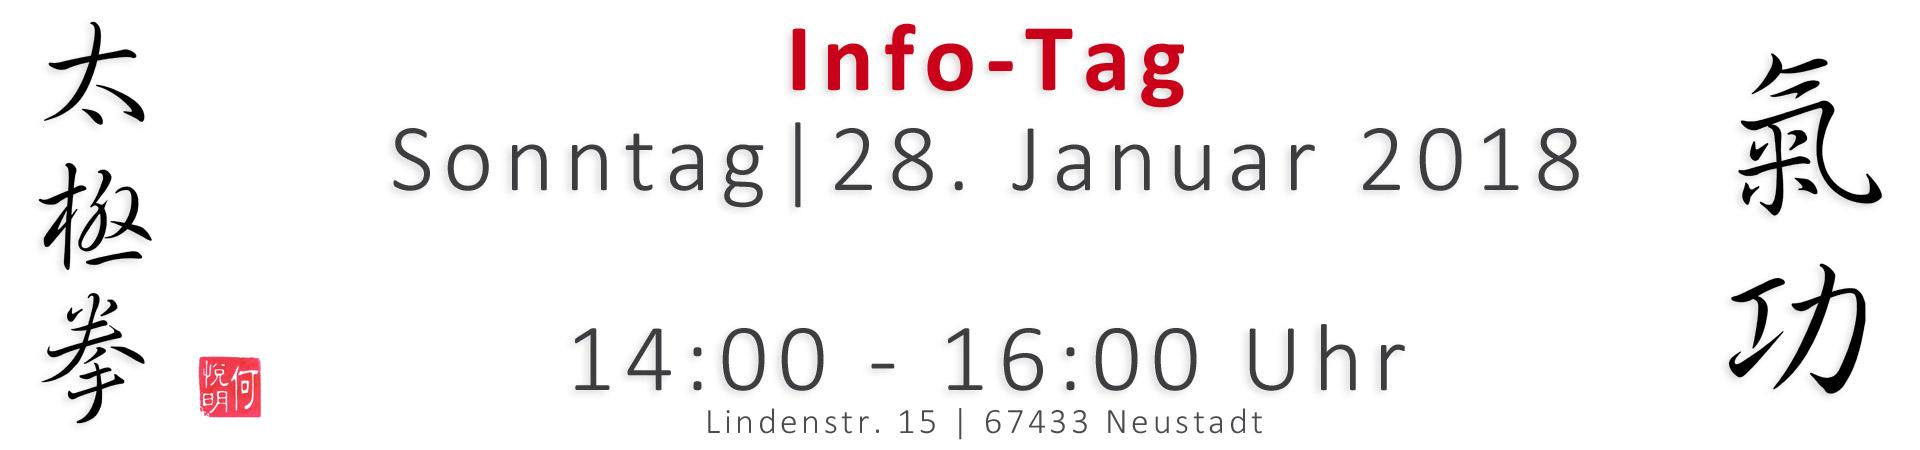 TaiChi-QiGong-BerndHaber-Infotag2018-1920x450